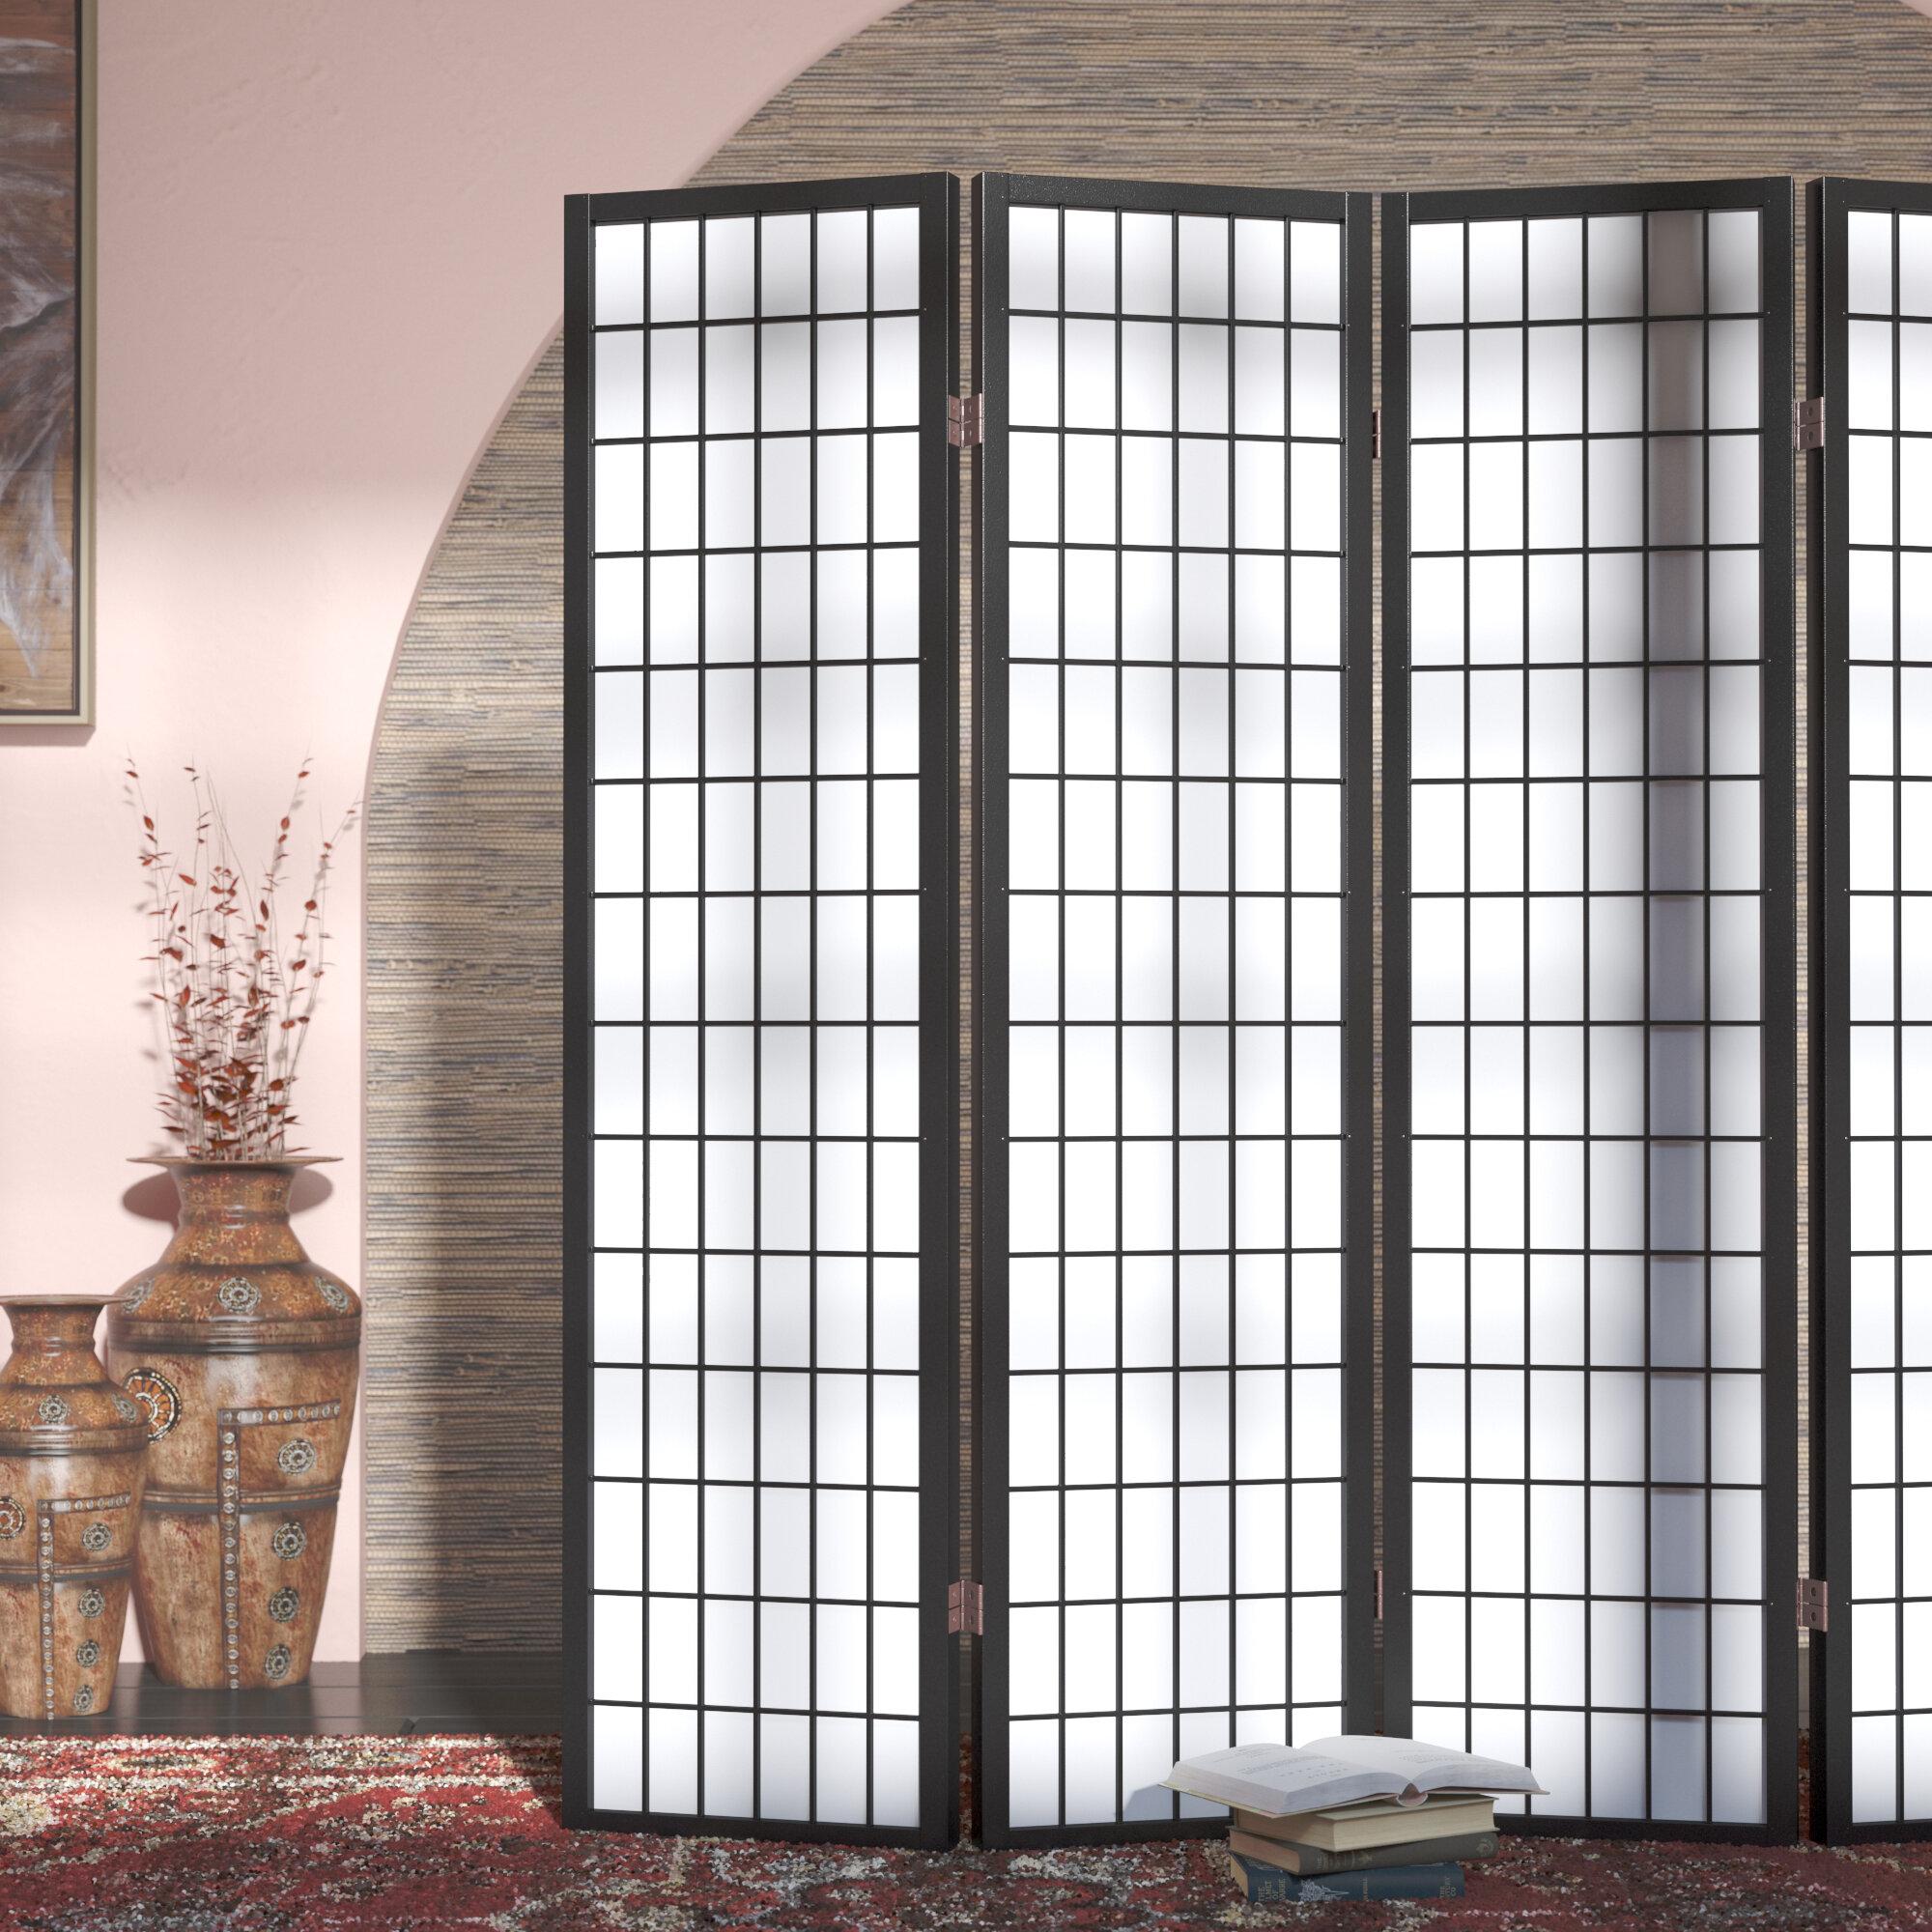 World Menagerie Hoceima 72 W X 71 H 4 Panel Folding Room Divider Reviews Wayfair